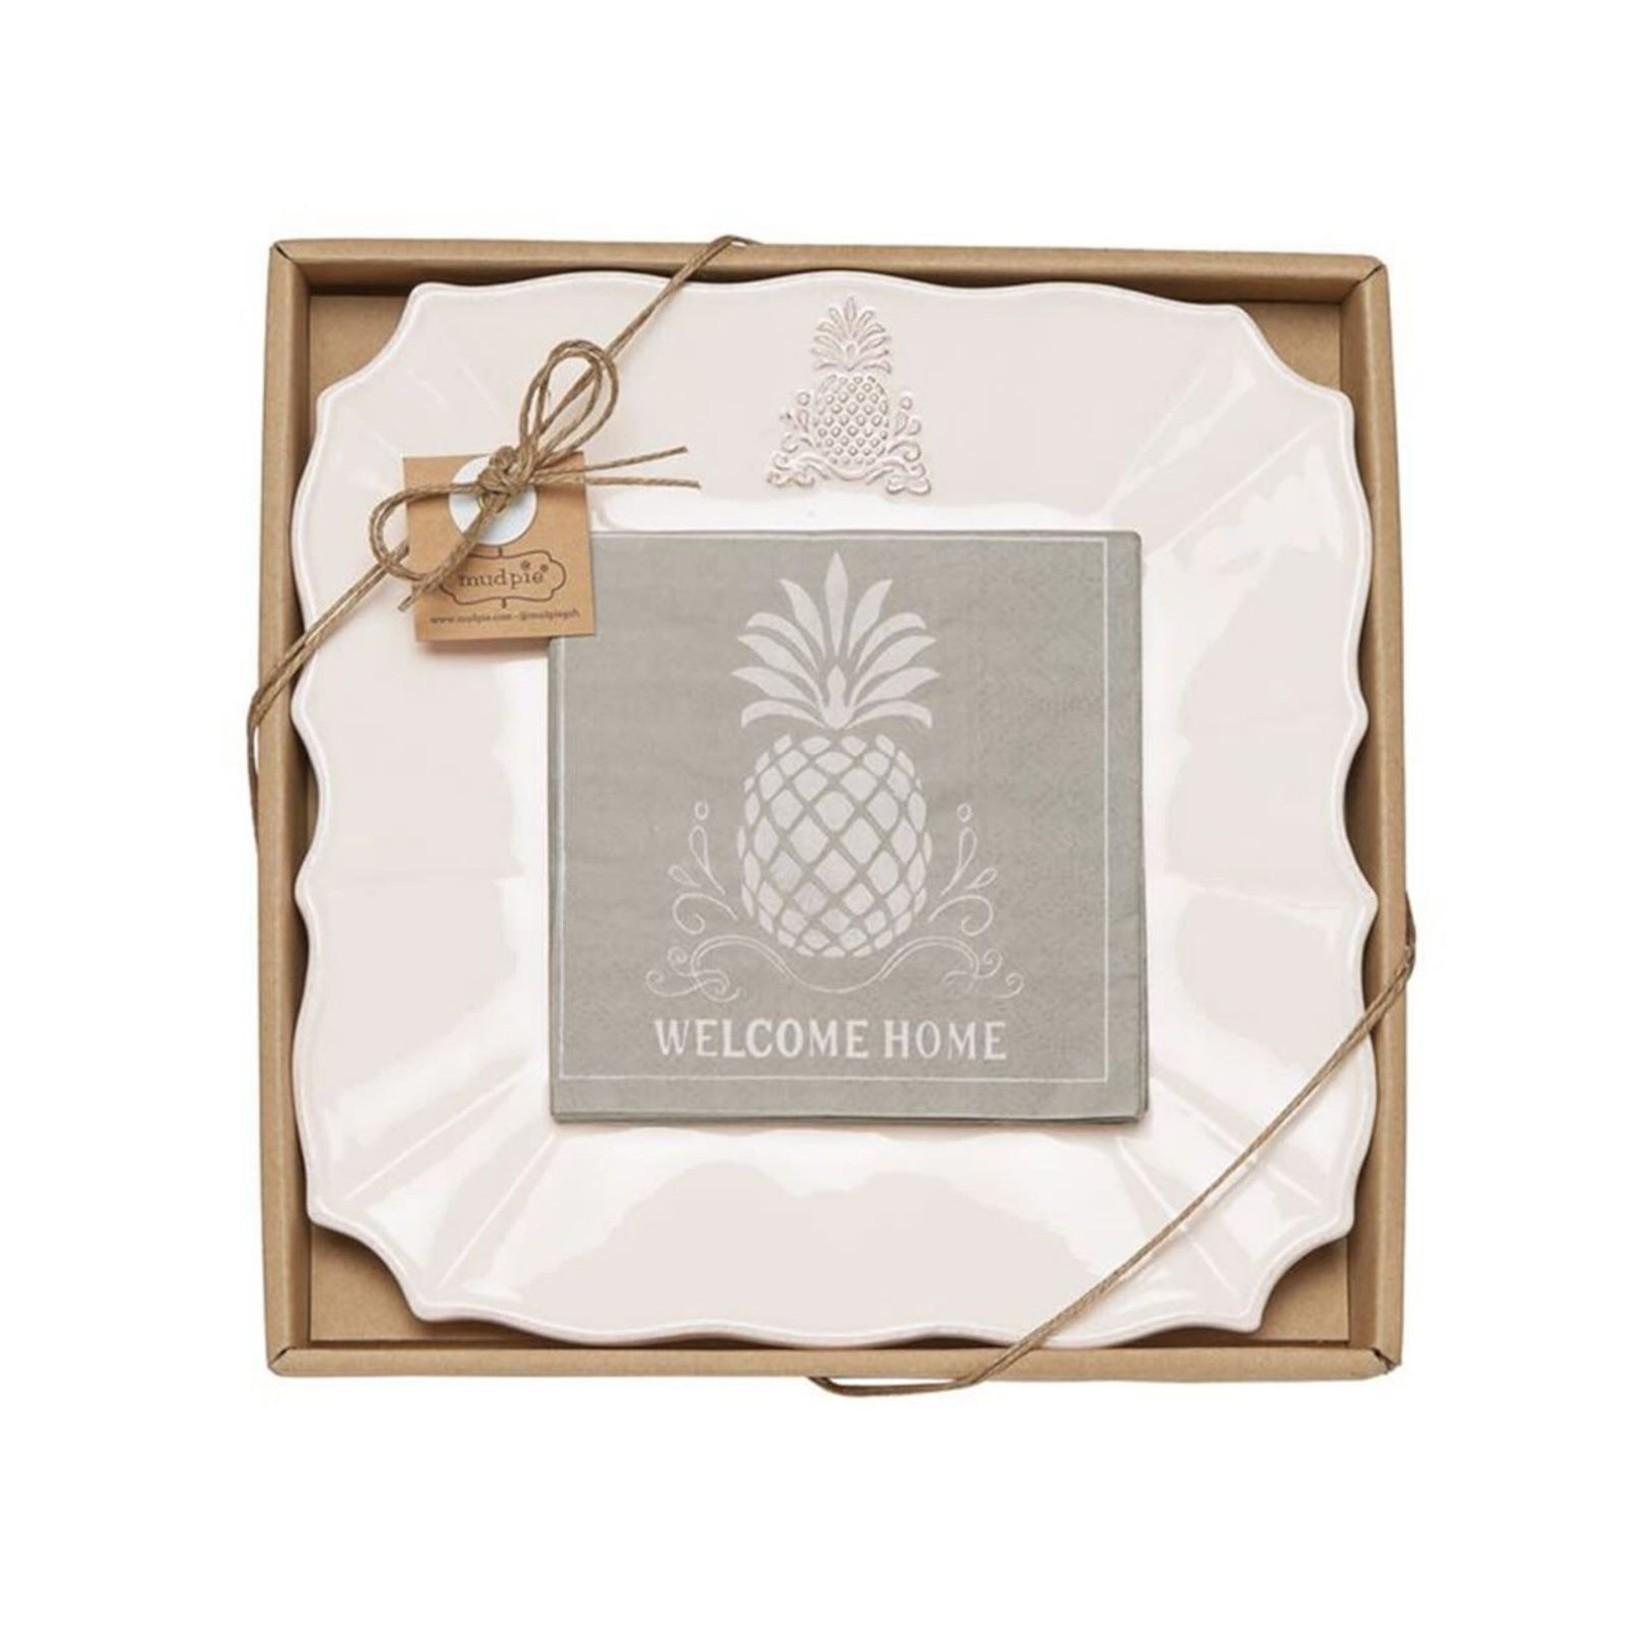 Pineapple Cheese Plate